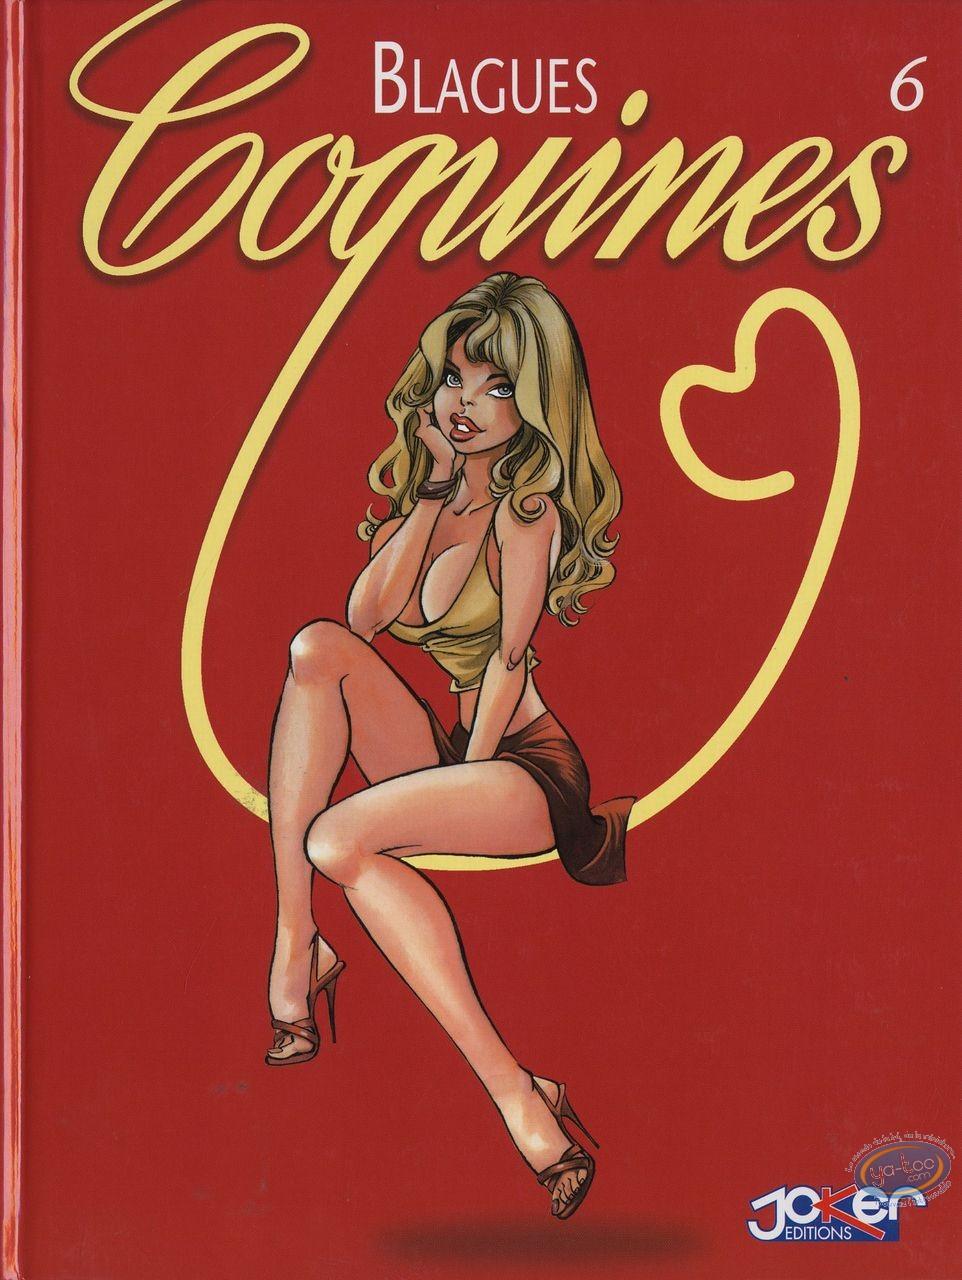 Adult European Comic Books, Blagues Coquines : Blagues Coquines, Vol 6